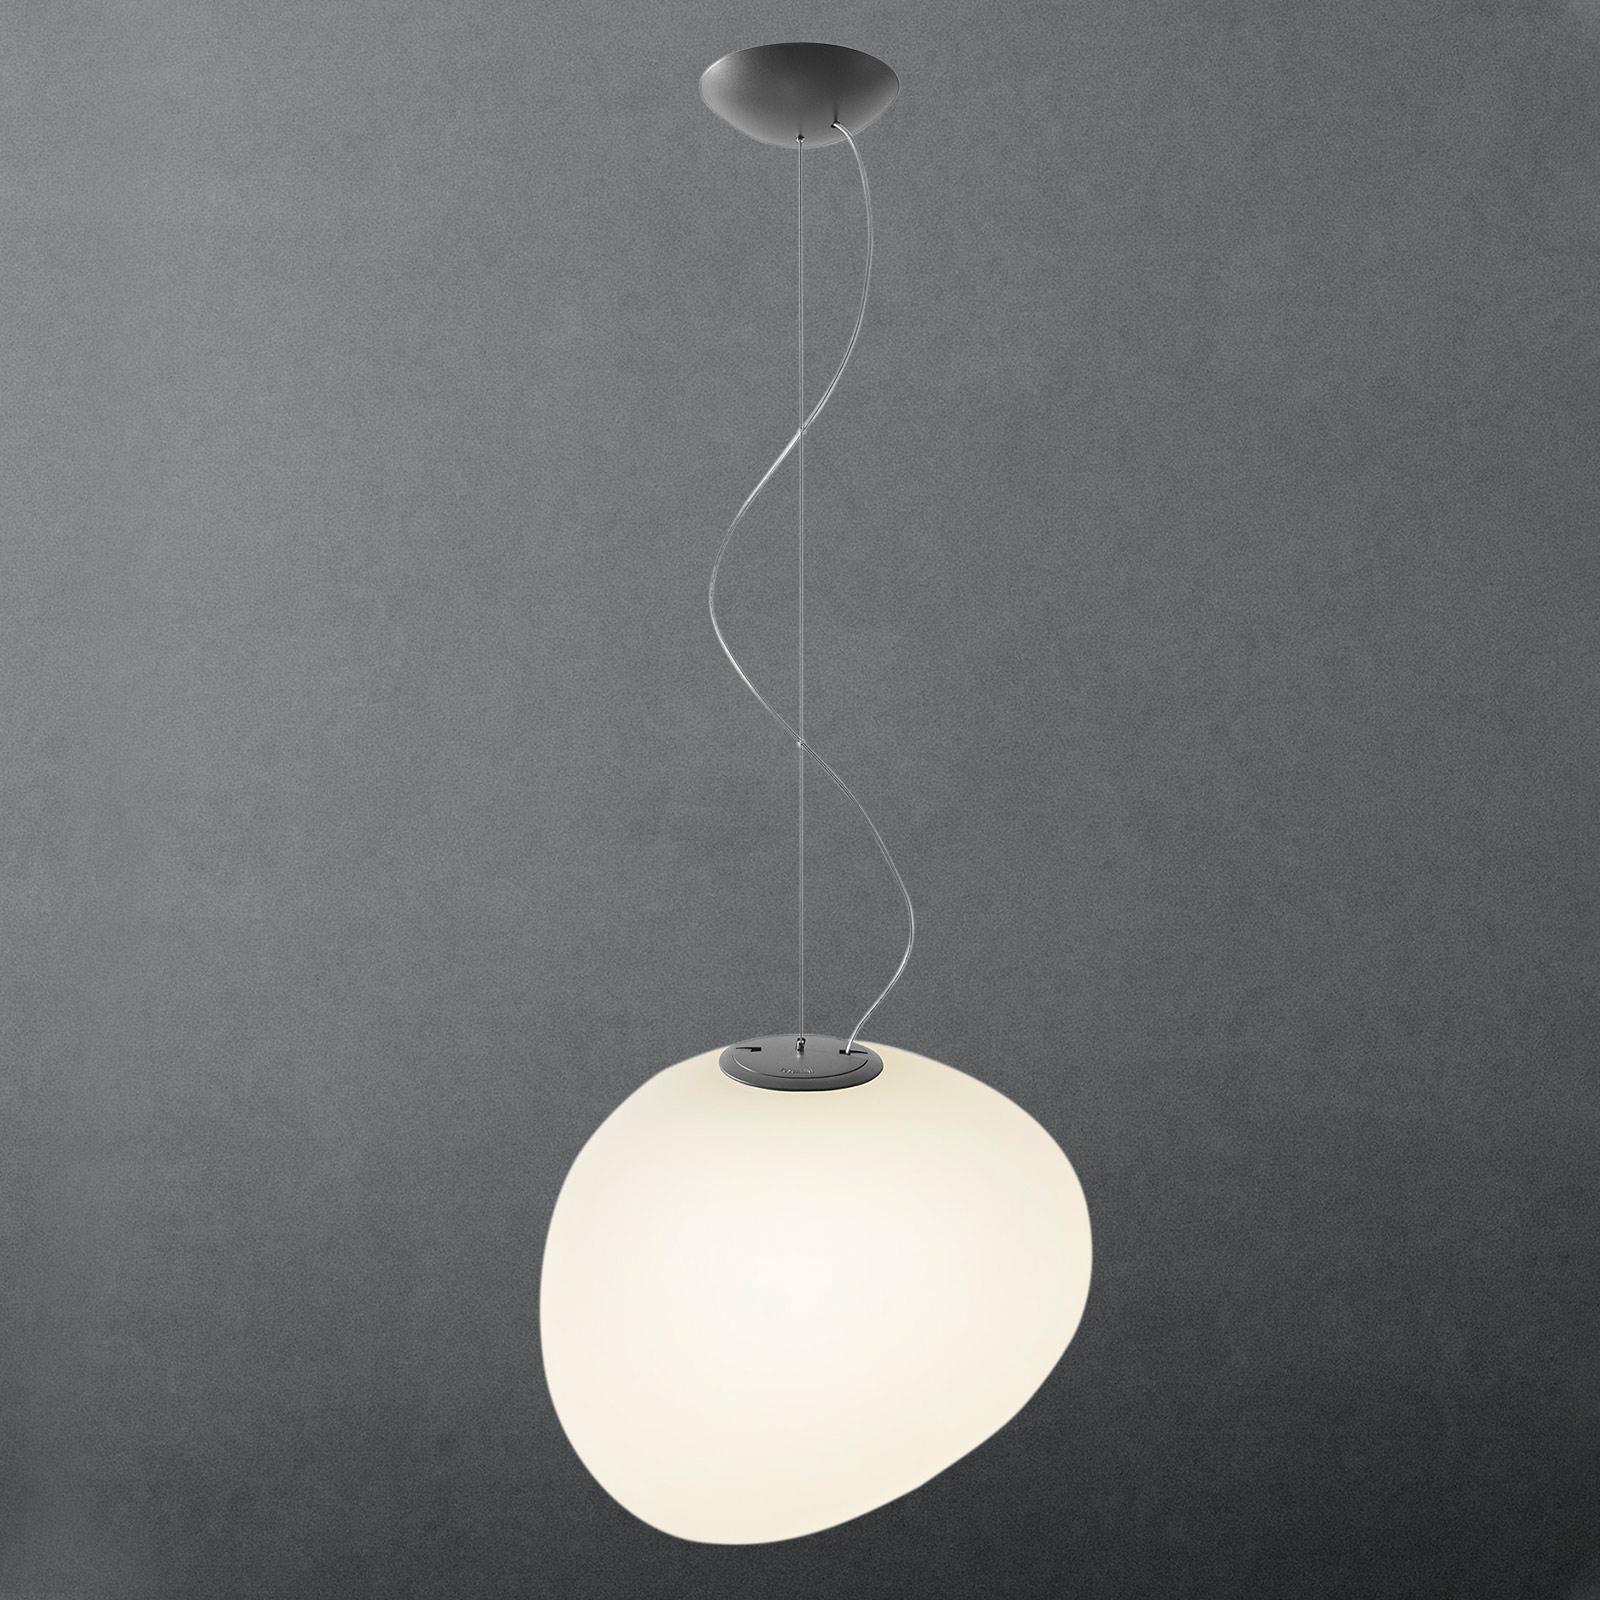 Foscarini MyLight Gregg grande hængelampe, grafit